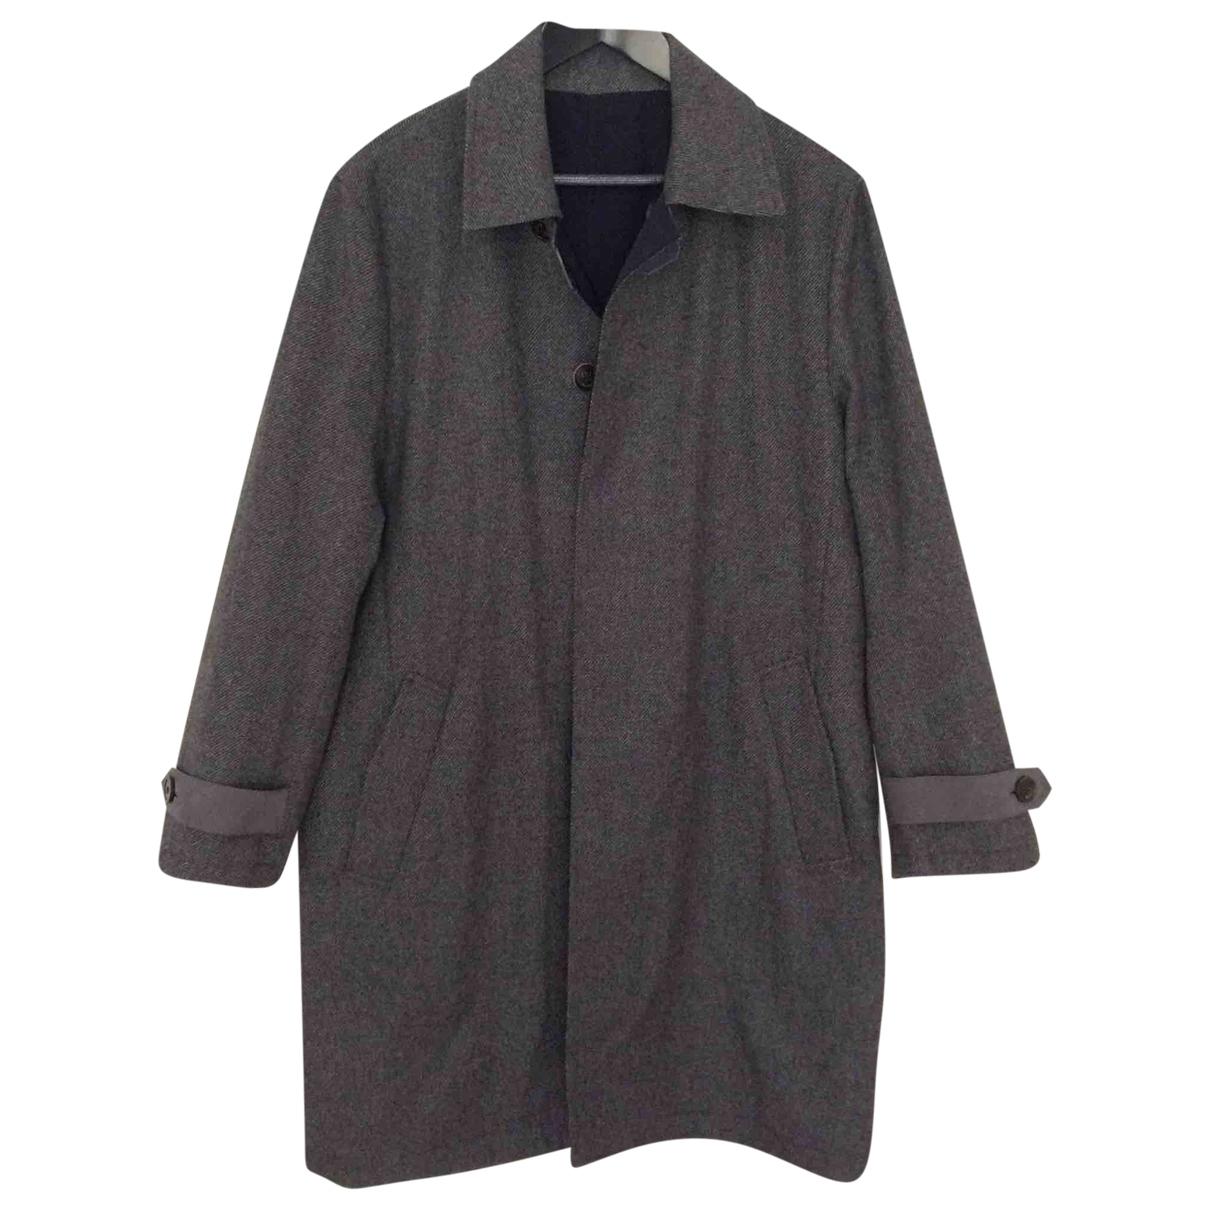 Berluti \N Anthracite Cashmere coat  for Men 48 FR